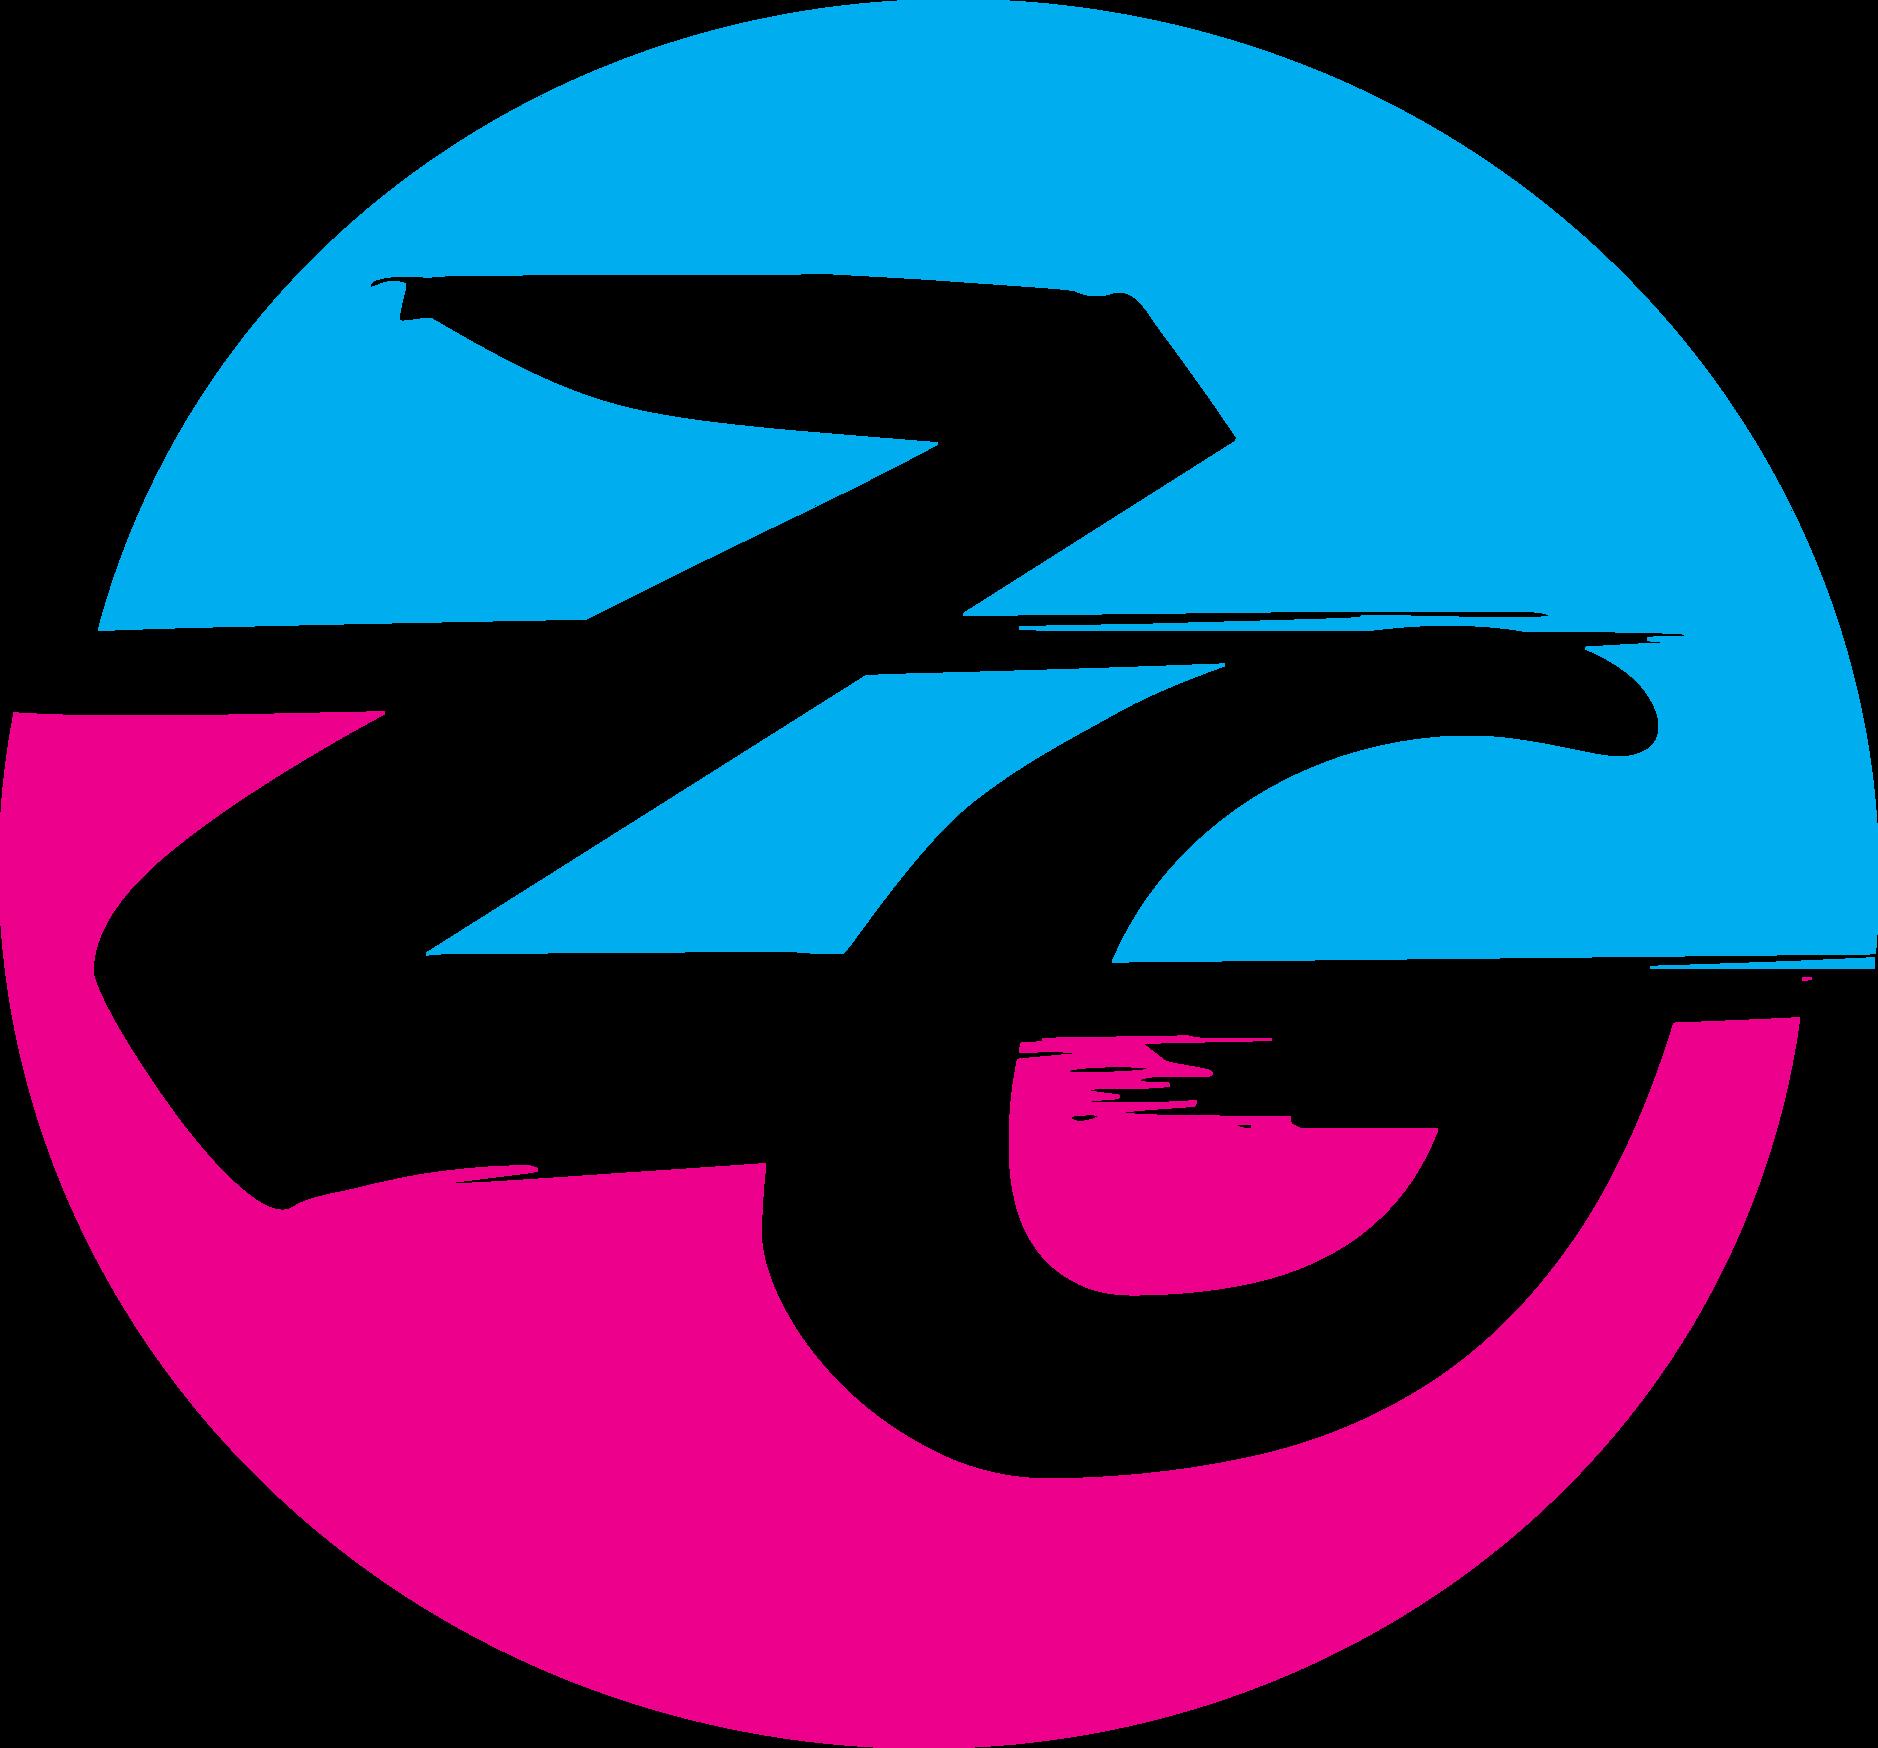 ZG Peinture Sàrl